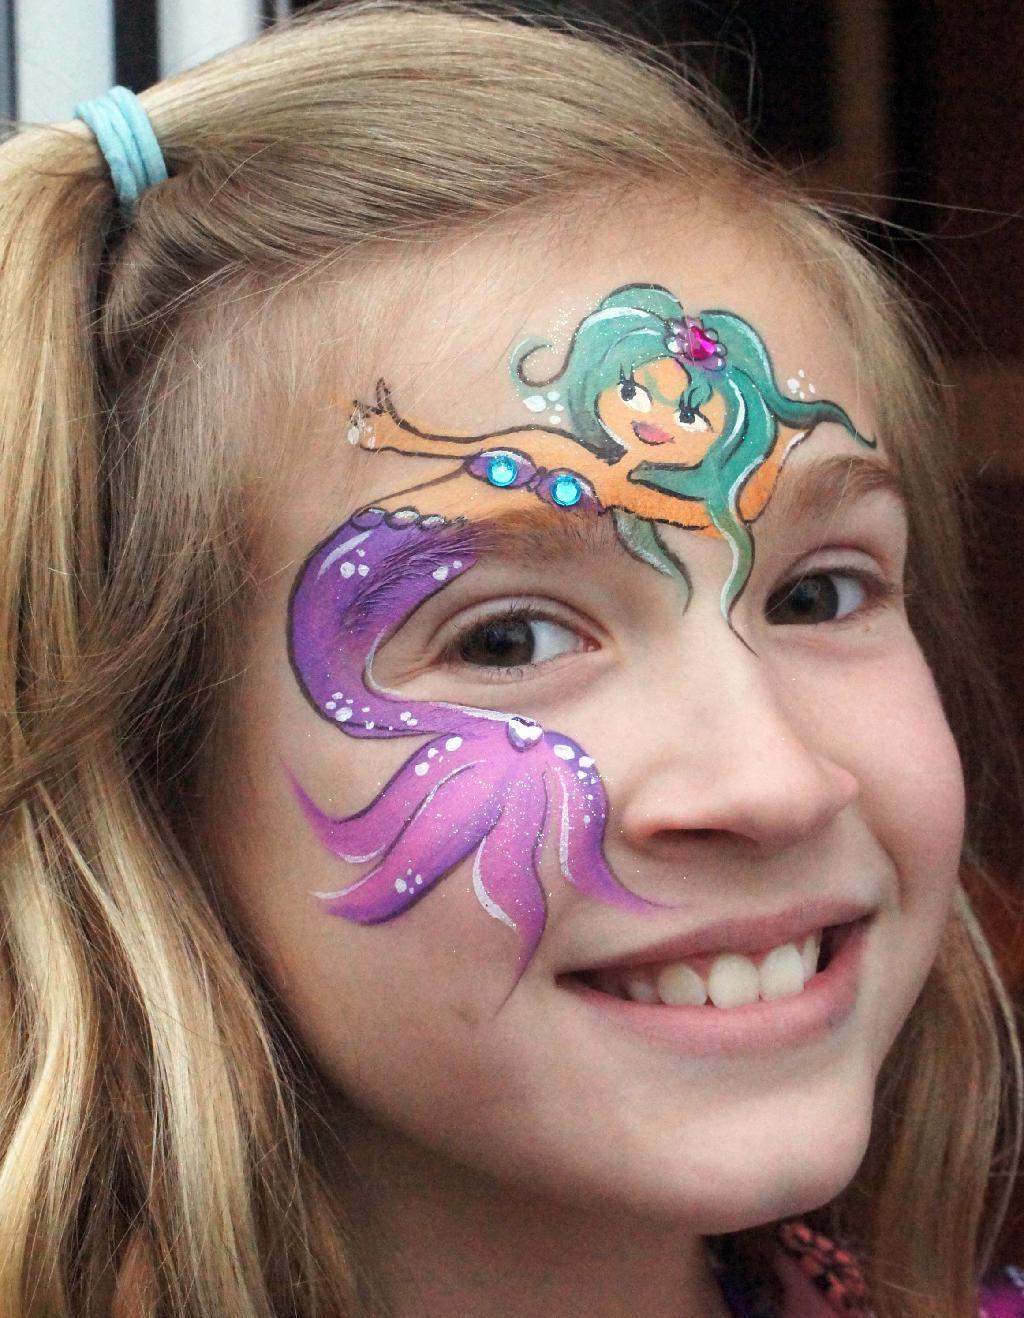 face painting pinterest kinder schminken kinderschminken und gesicht. Black Bedroom Furniture Sets. Home Design Ideas